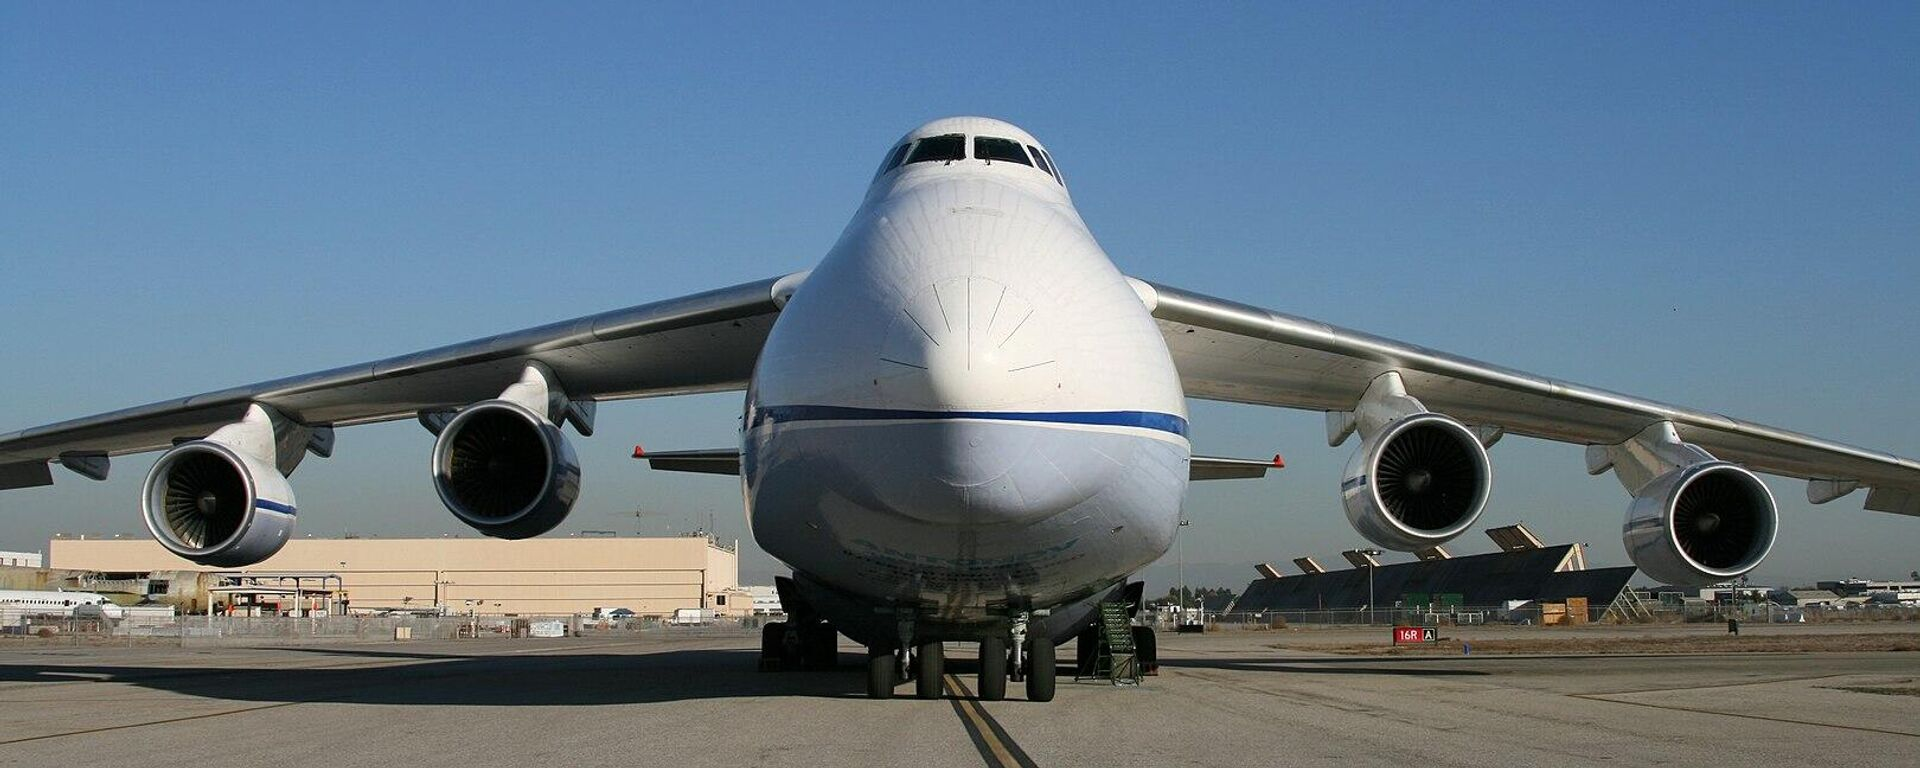 Antonow An-124 (Archivbild) - SNA, 1920, 19.05.2021